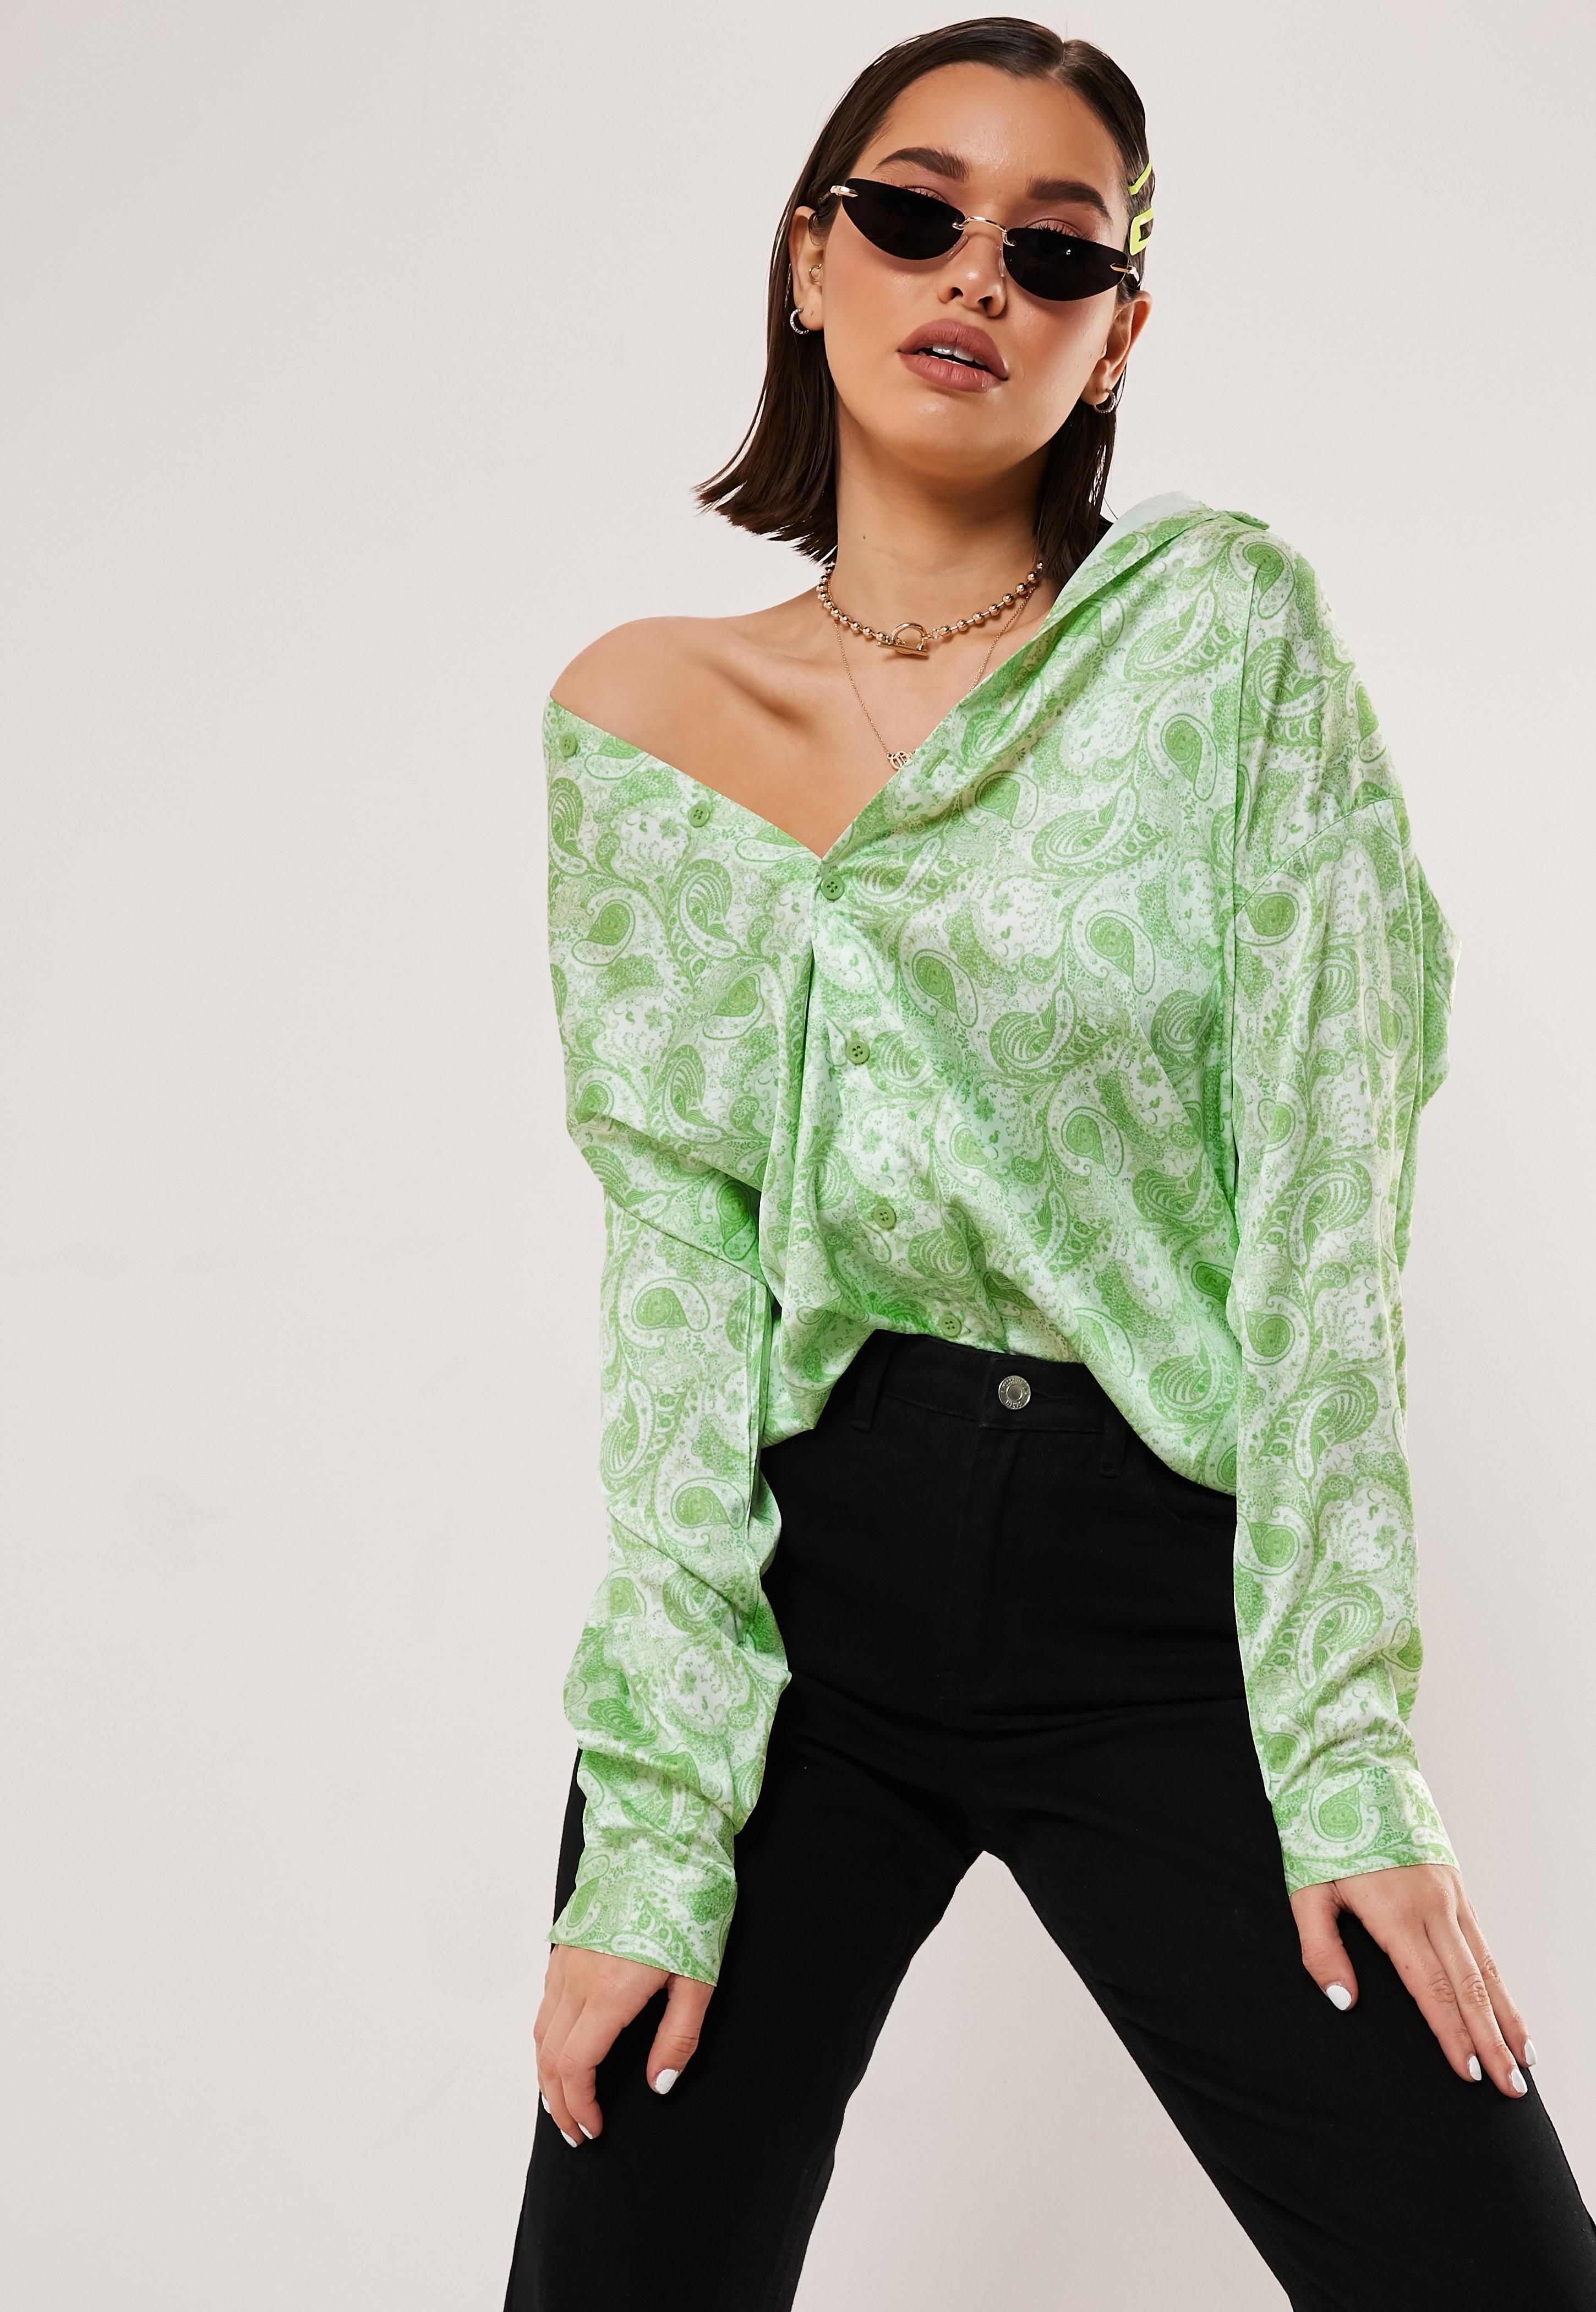 5f9e3e01b78cc5 Satin Tops - Women's Silk Tops Online | Missguided